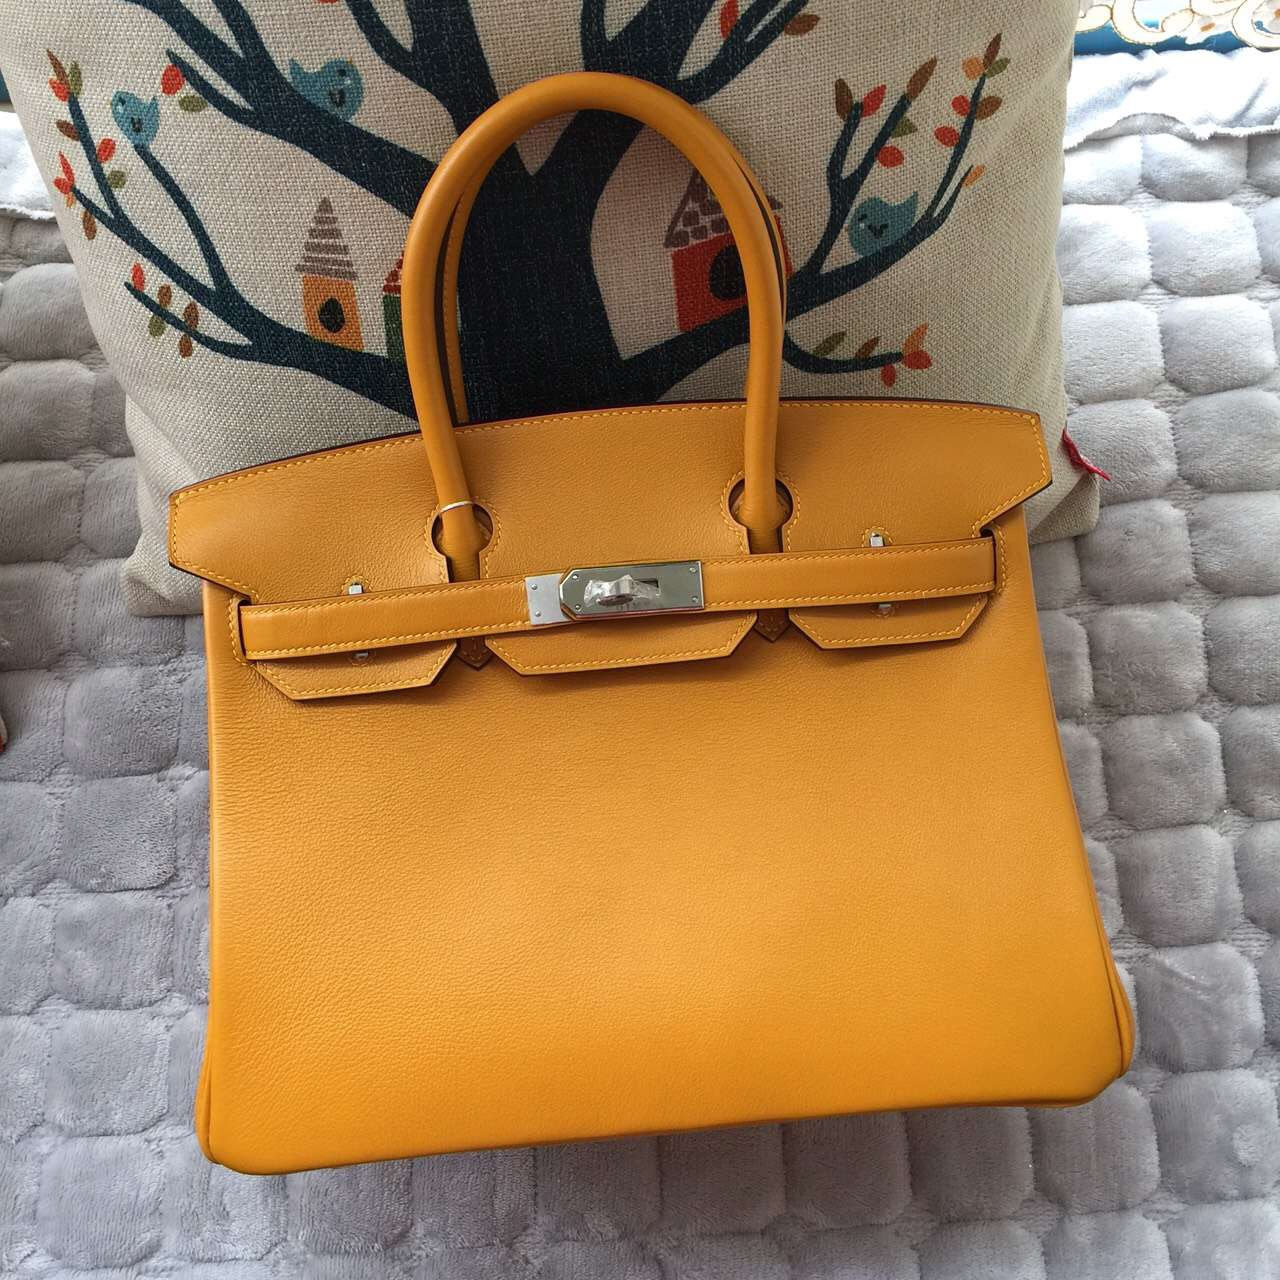 High Quality Hermes Birkin Bag 30CM 9V Sun Yellow Swift Leather Women's Tote Bag